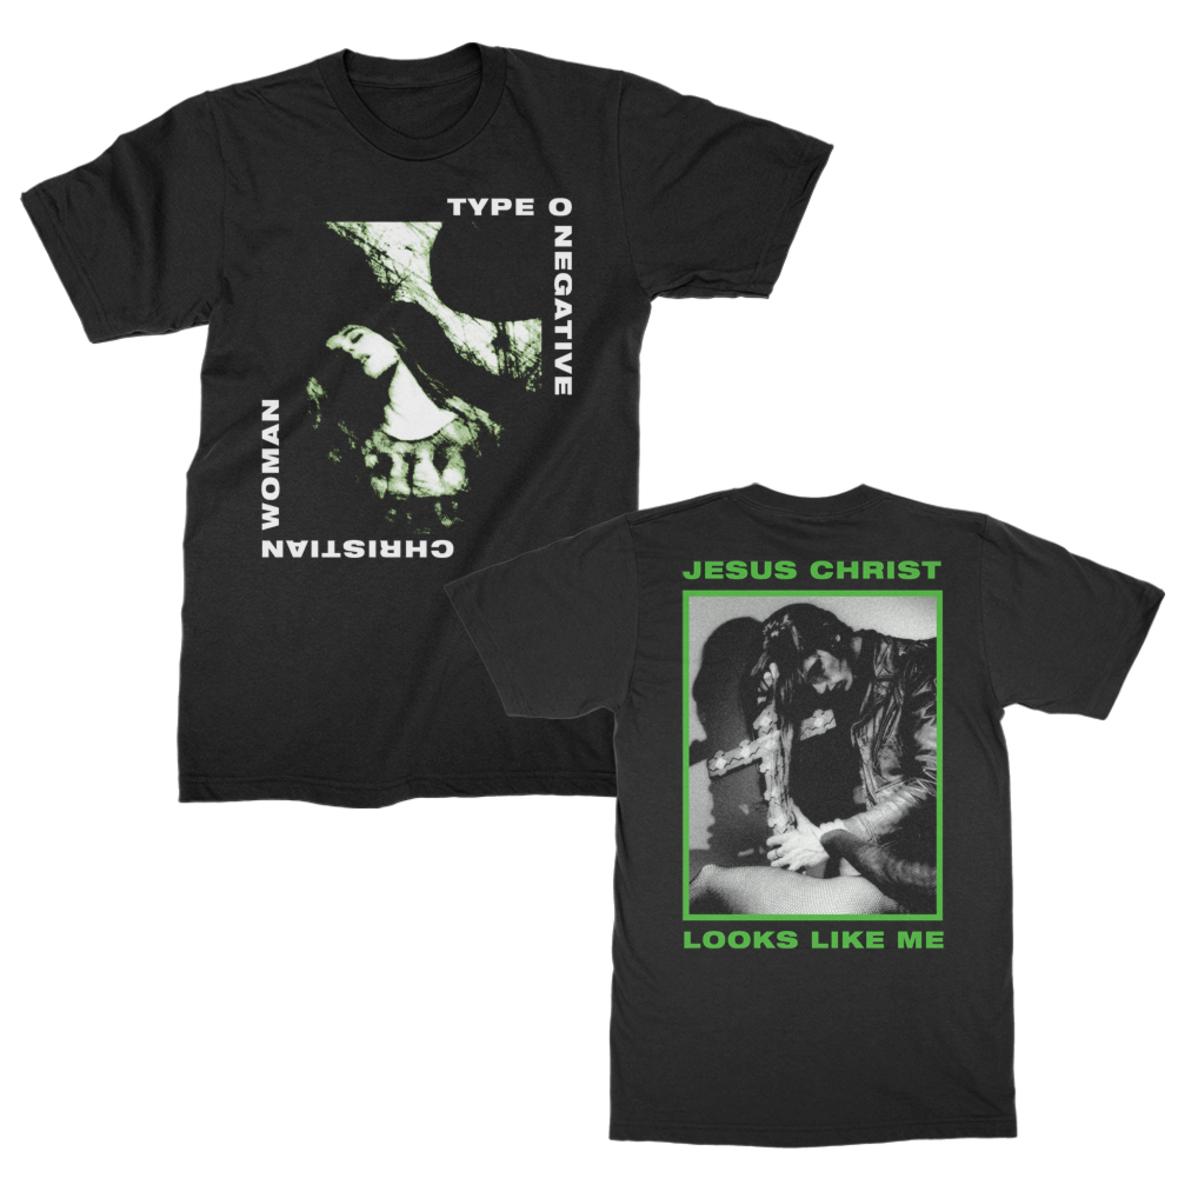 Type O Negative - Christian Woman T-Shirt